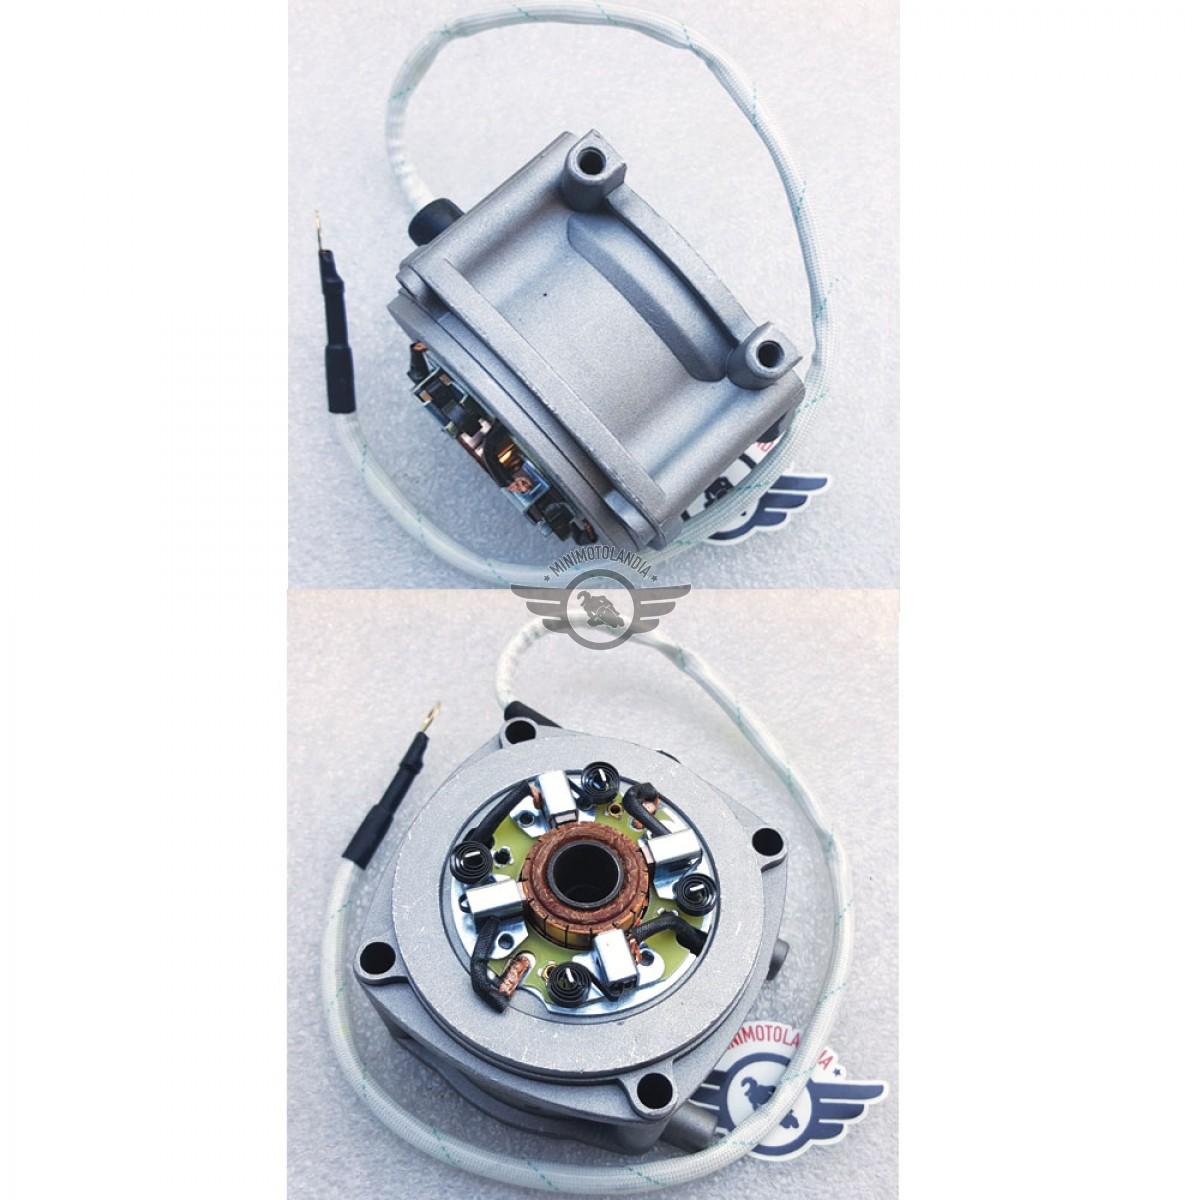 Schema Elettrico Motorino Avviamento : Motorino avviamento elettrico motore miniquad atv